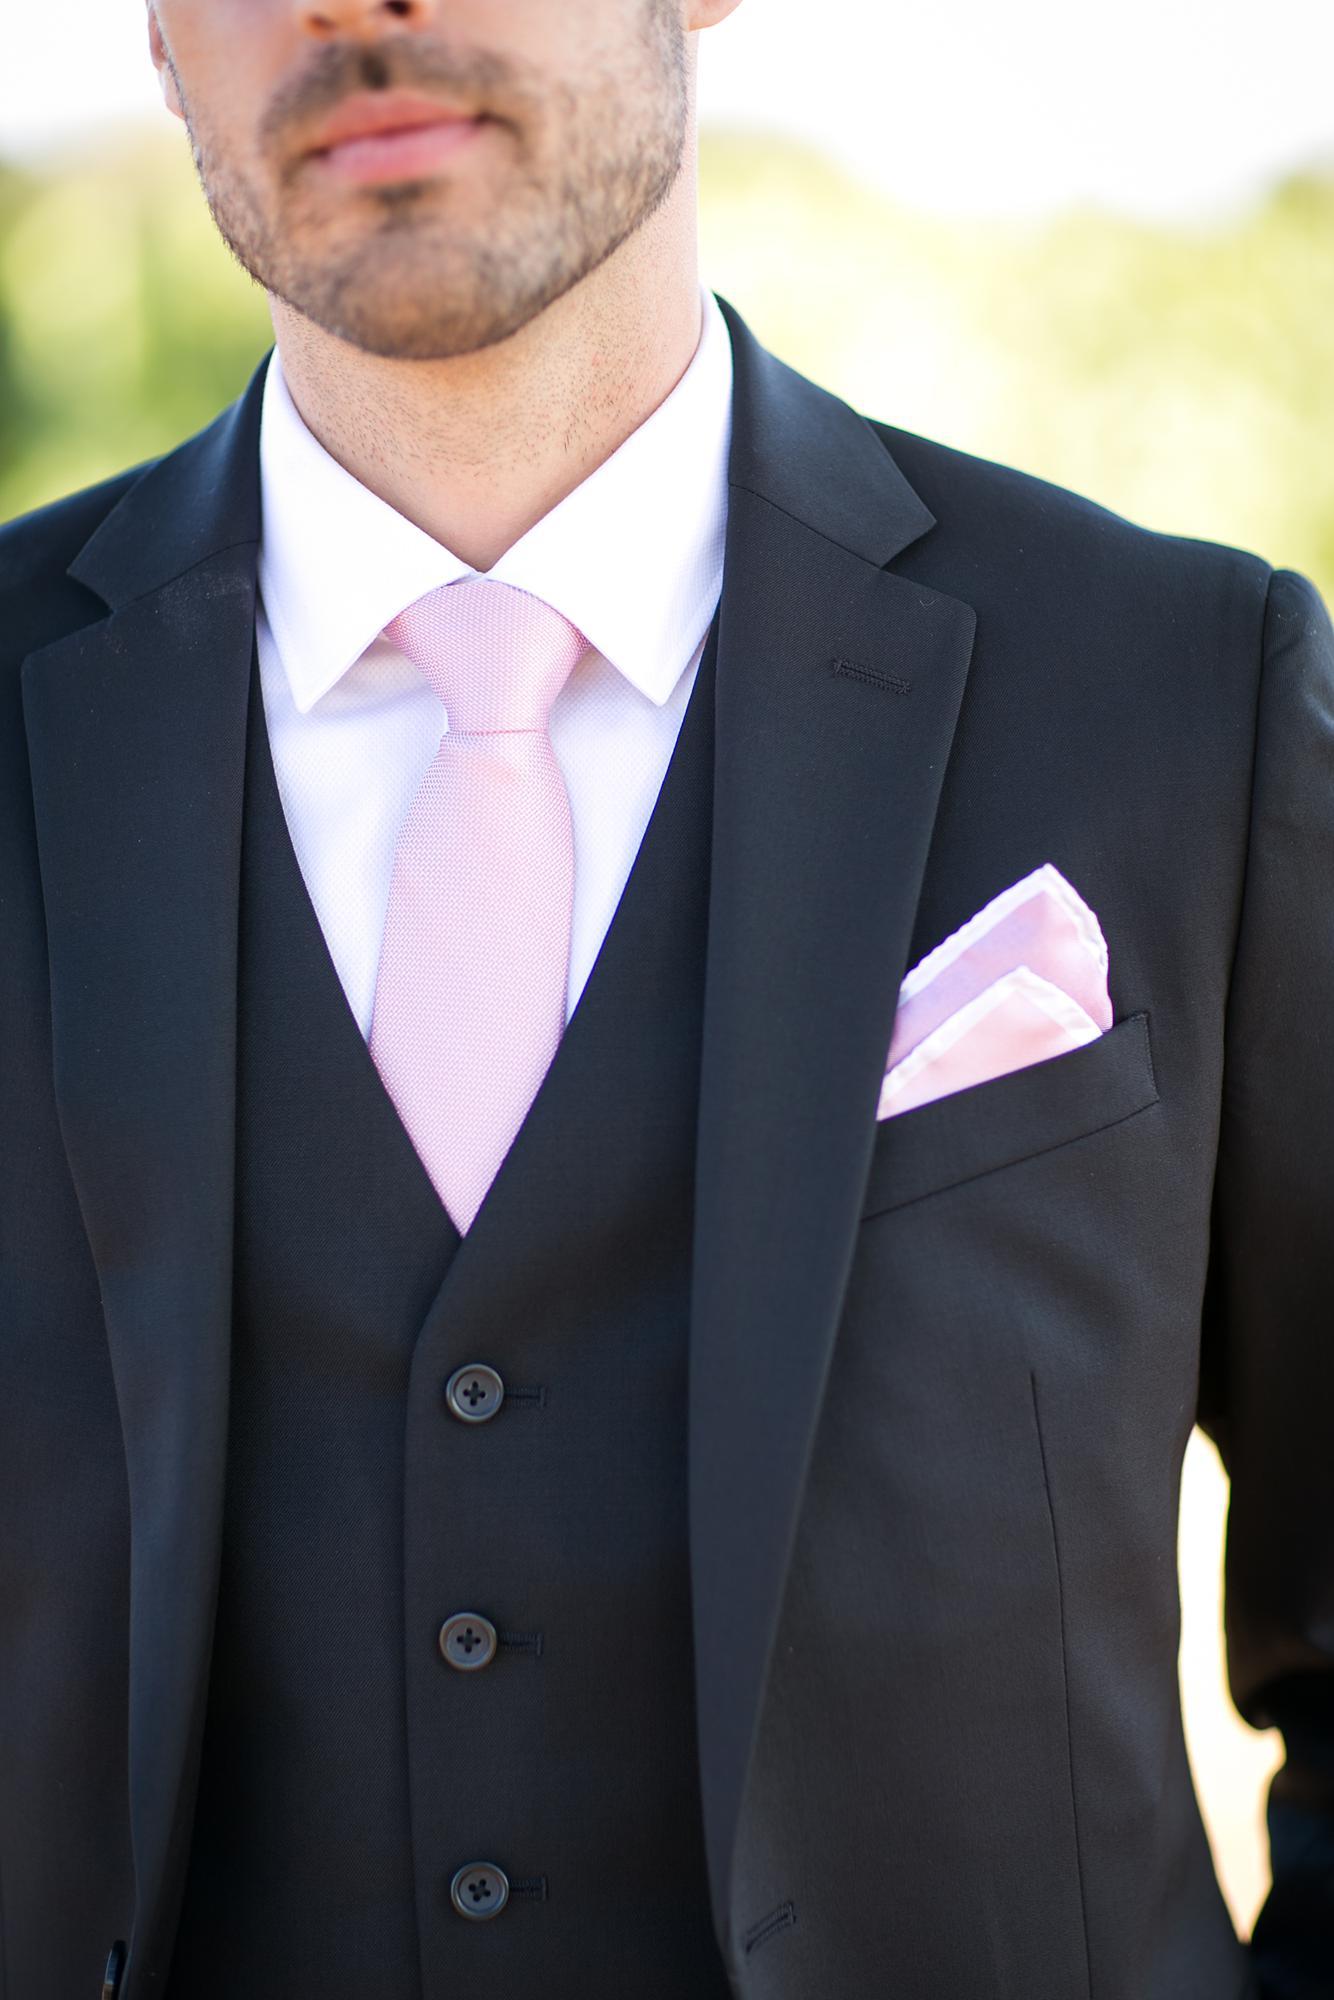 firestone-winery-wedding-MR-14.jpg